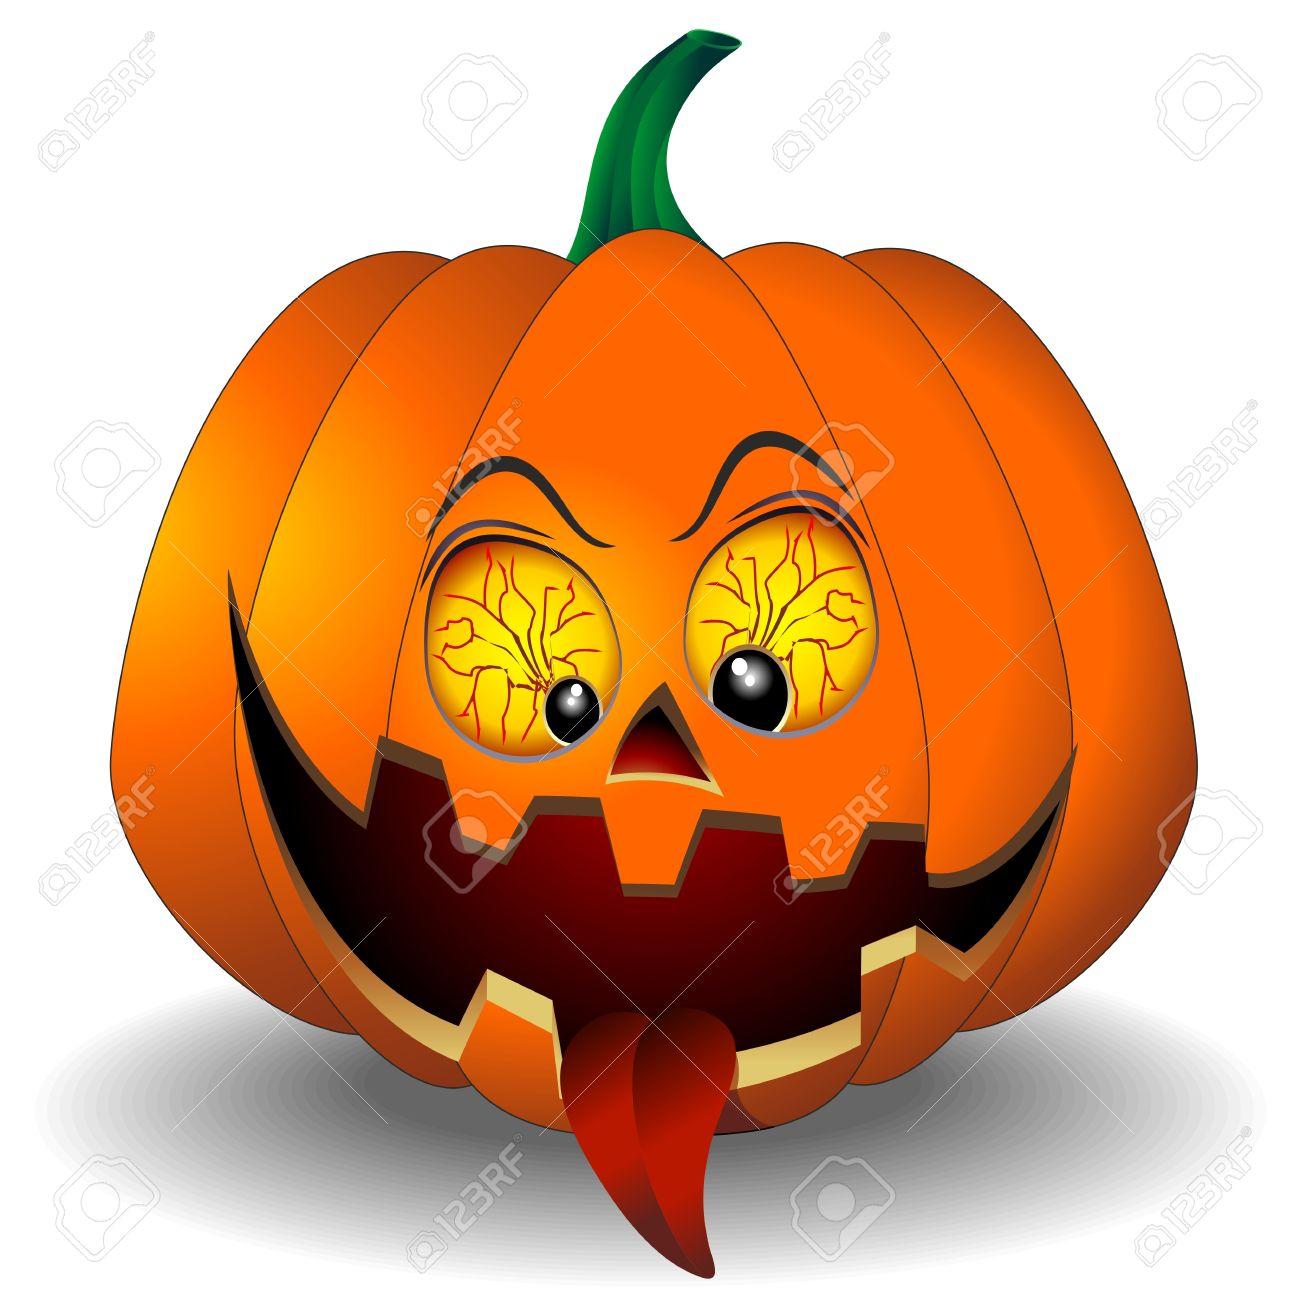 Funny And Scary Halloween Pumpkin Cartoon Stock Vector   21299351